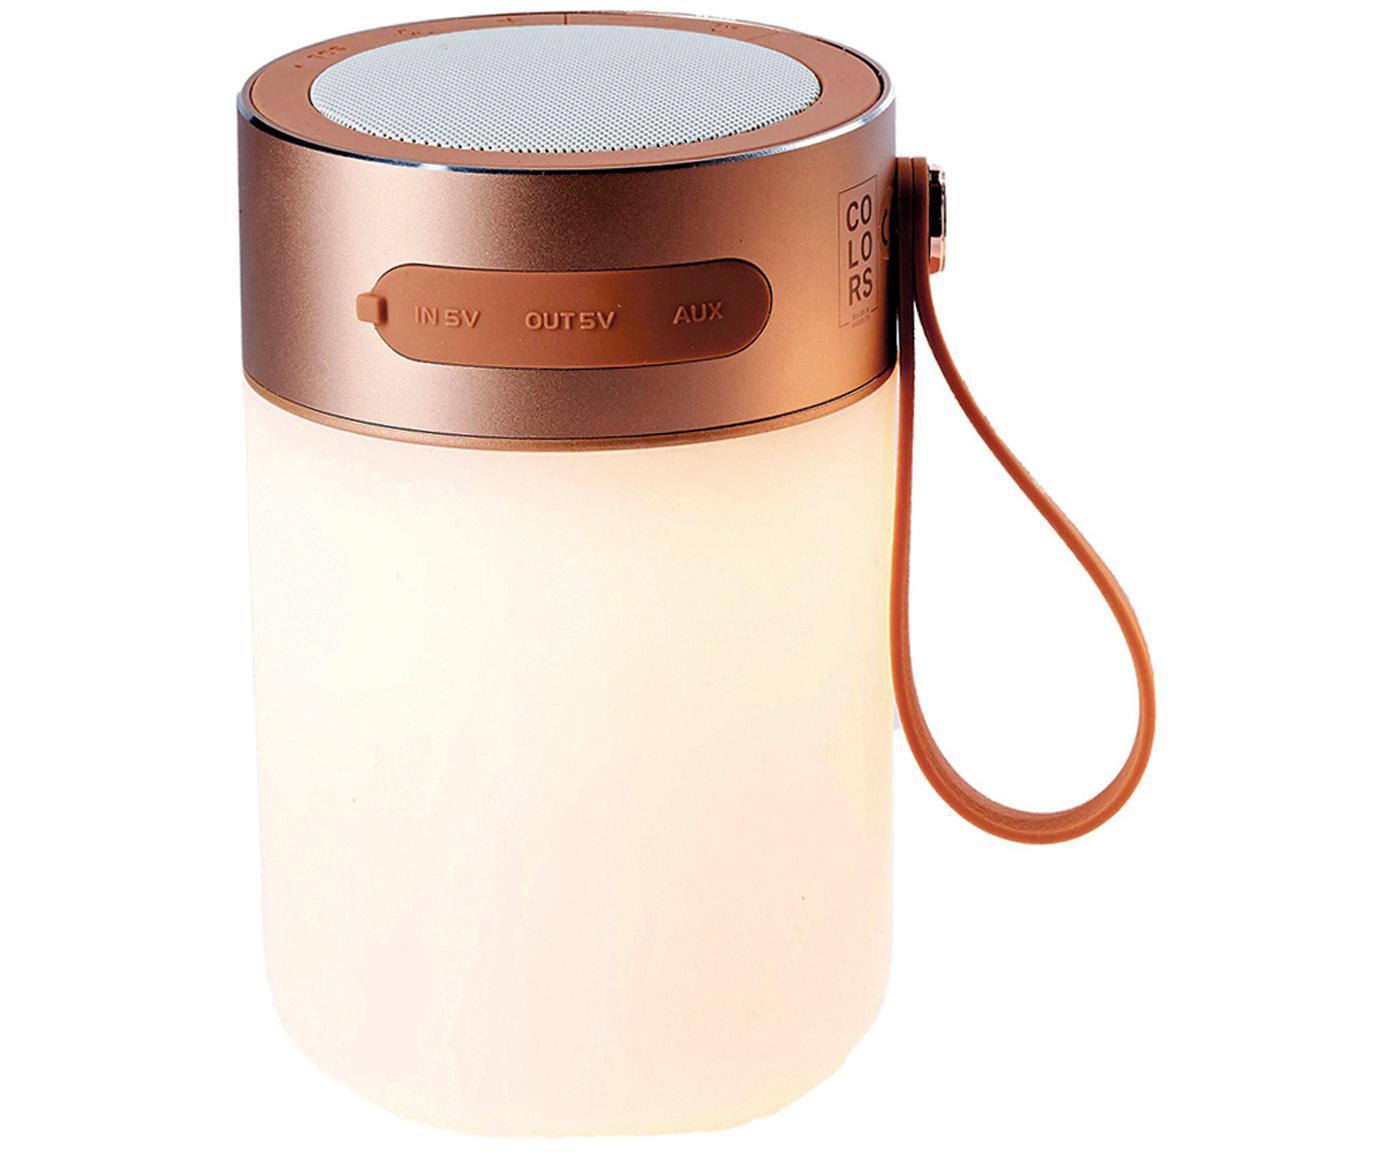 Lampada da esterno a LED portatile Sound Jar, Quadrante: metallo, Paralume: materiale sintetico, Color rame, bianco, Ø 9 x Alt. 14 cm